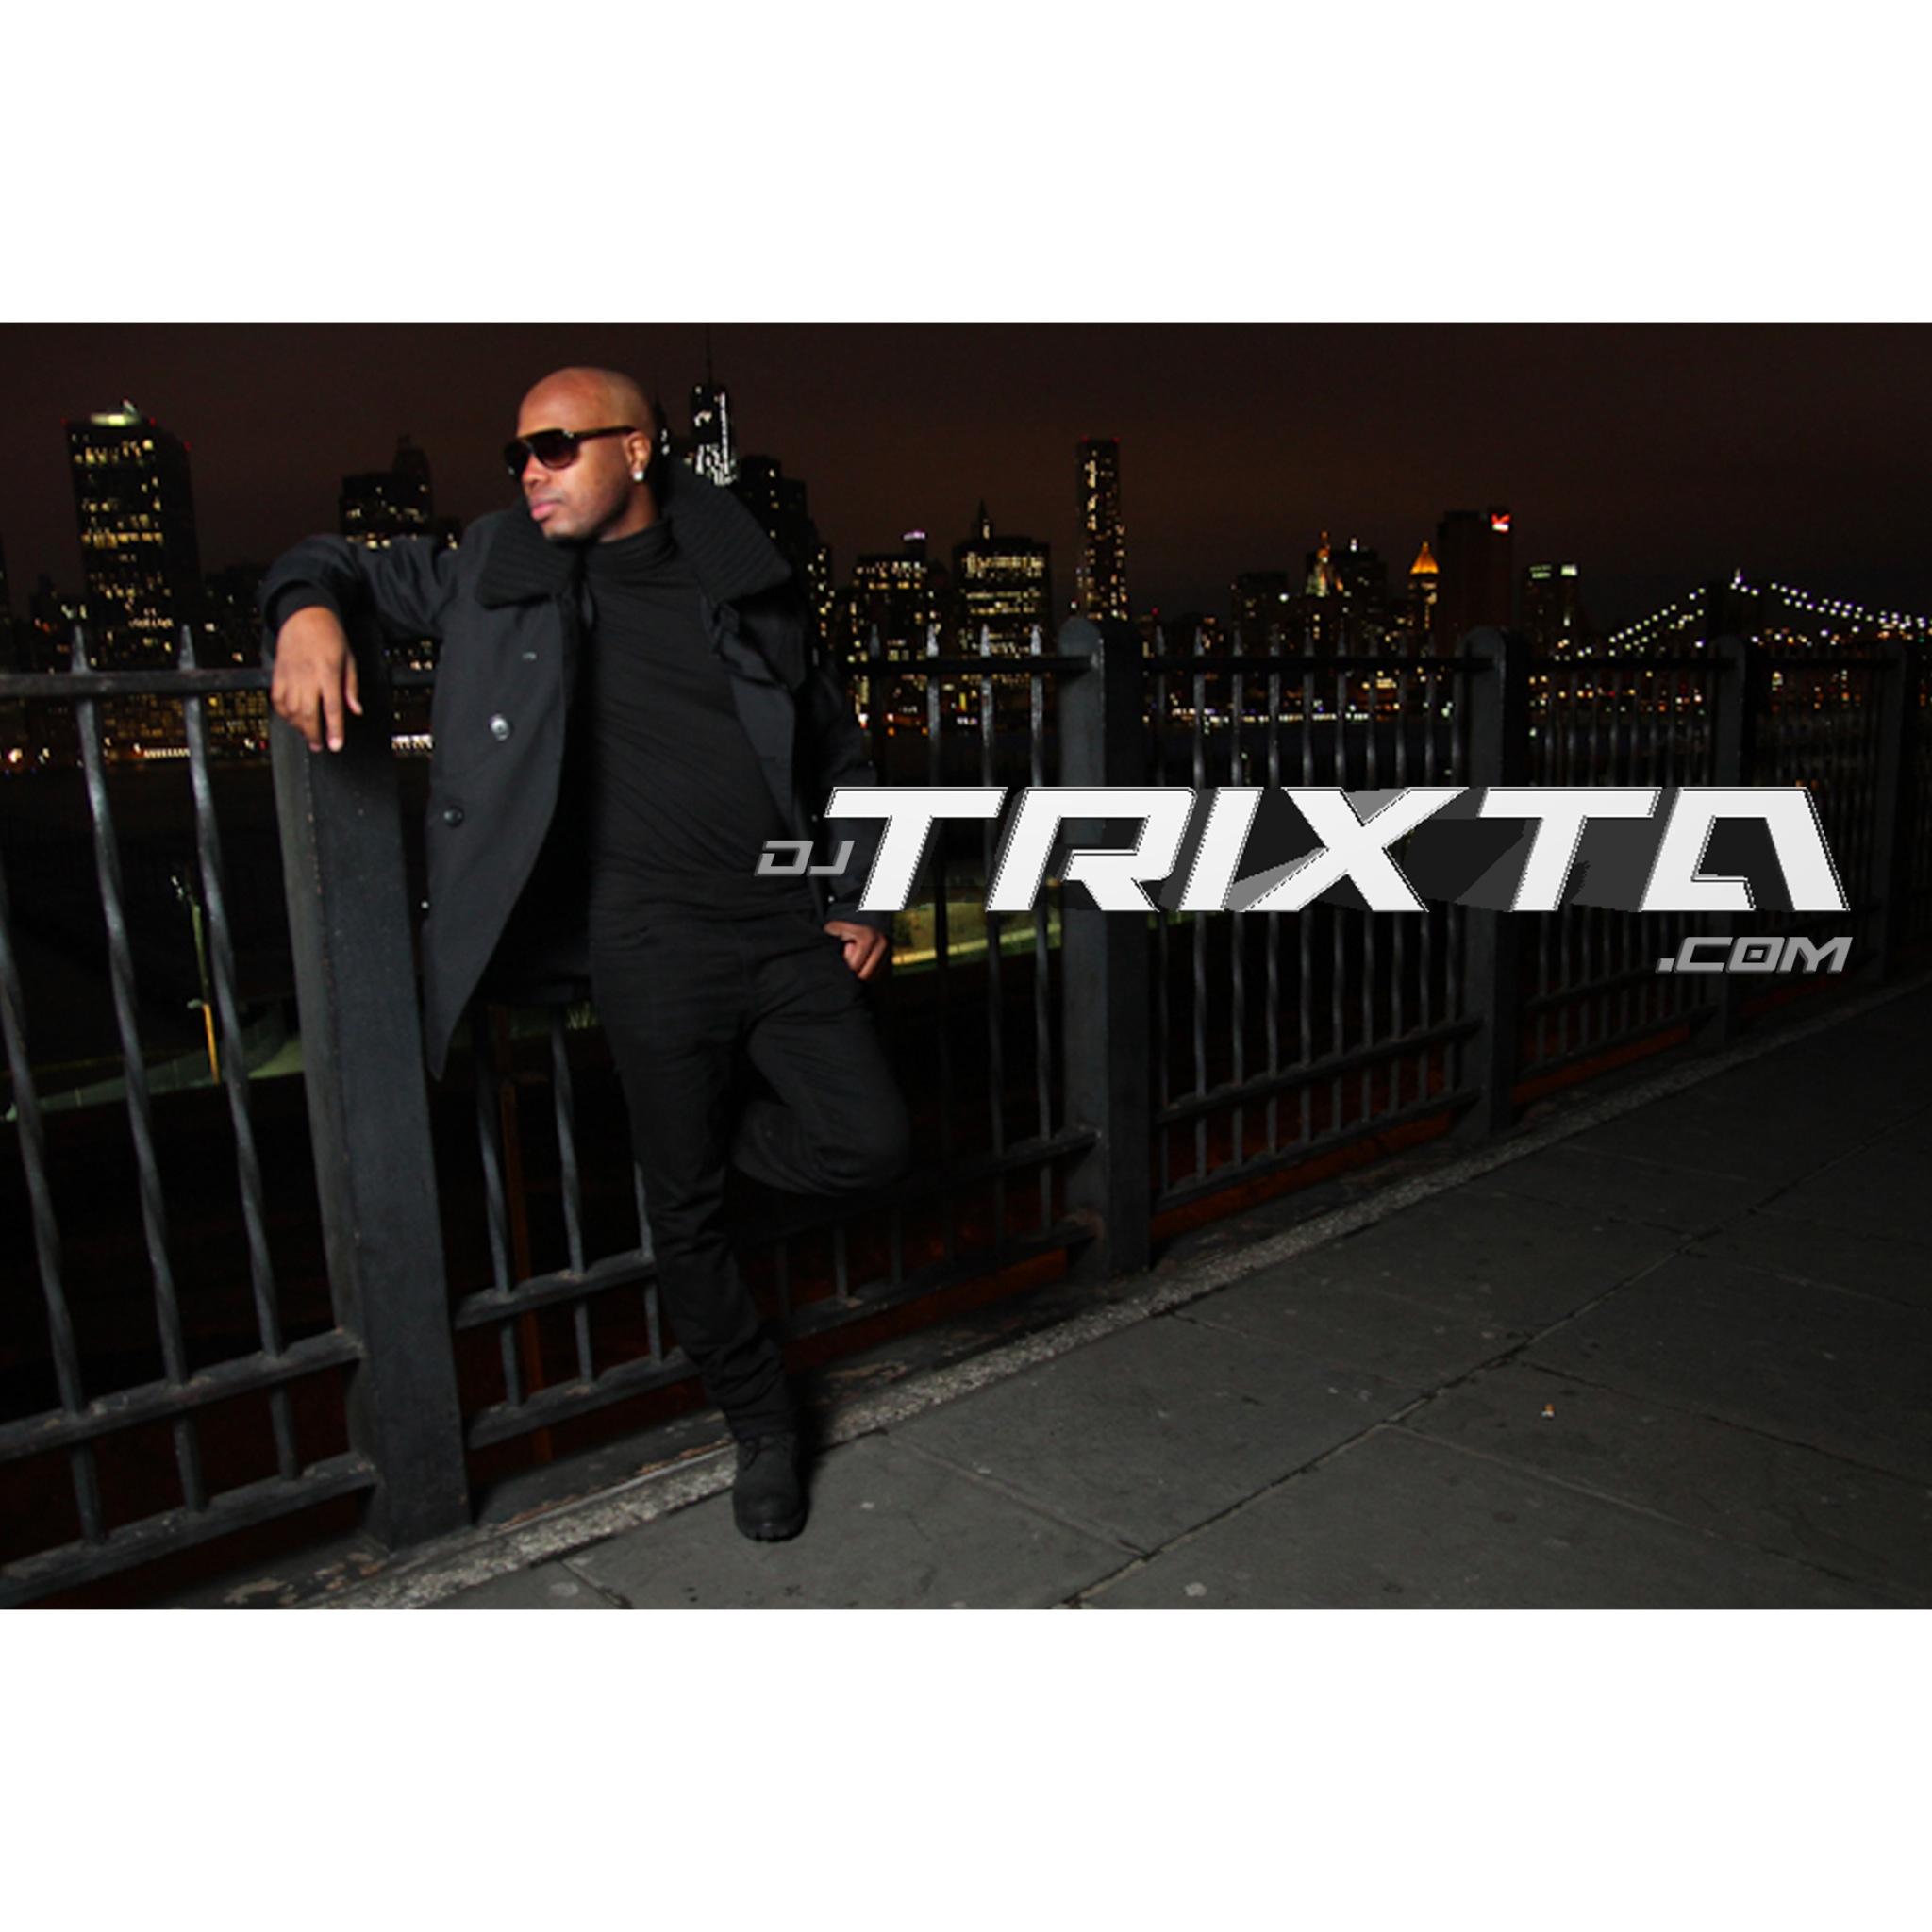 Dj Trixta's Podcast